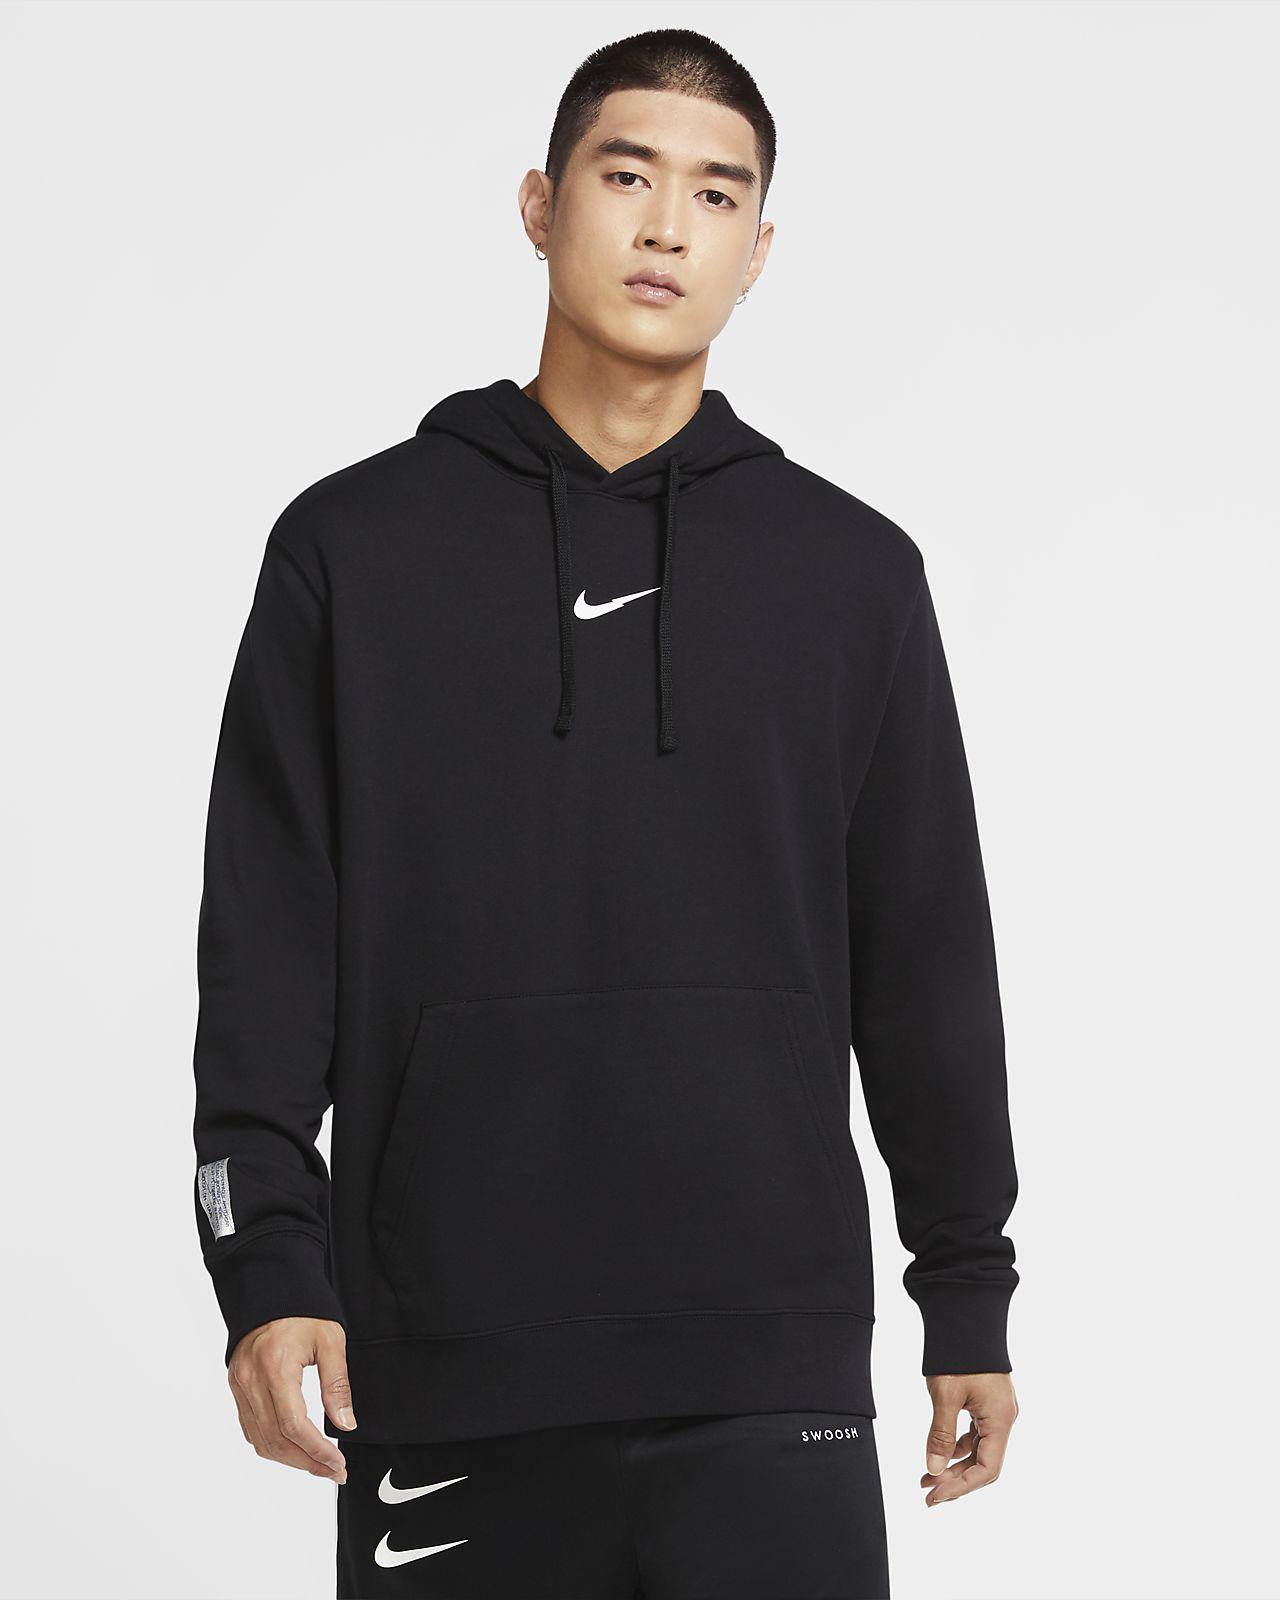 Sweat à capuche en molleton Nike Sportswear pour Homme